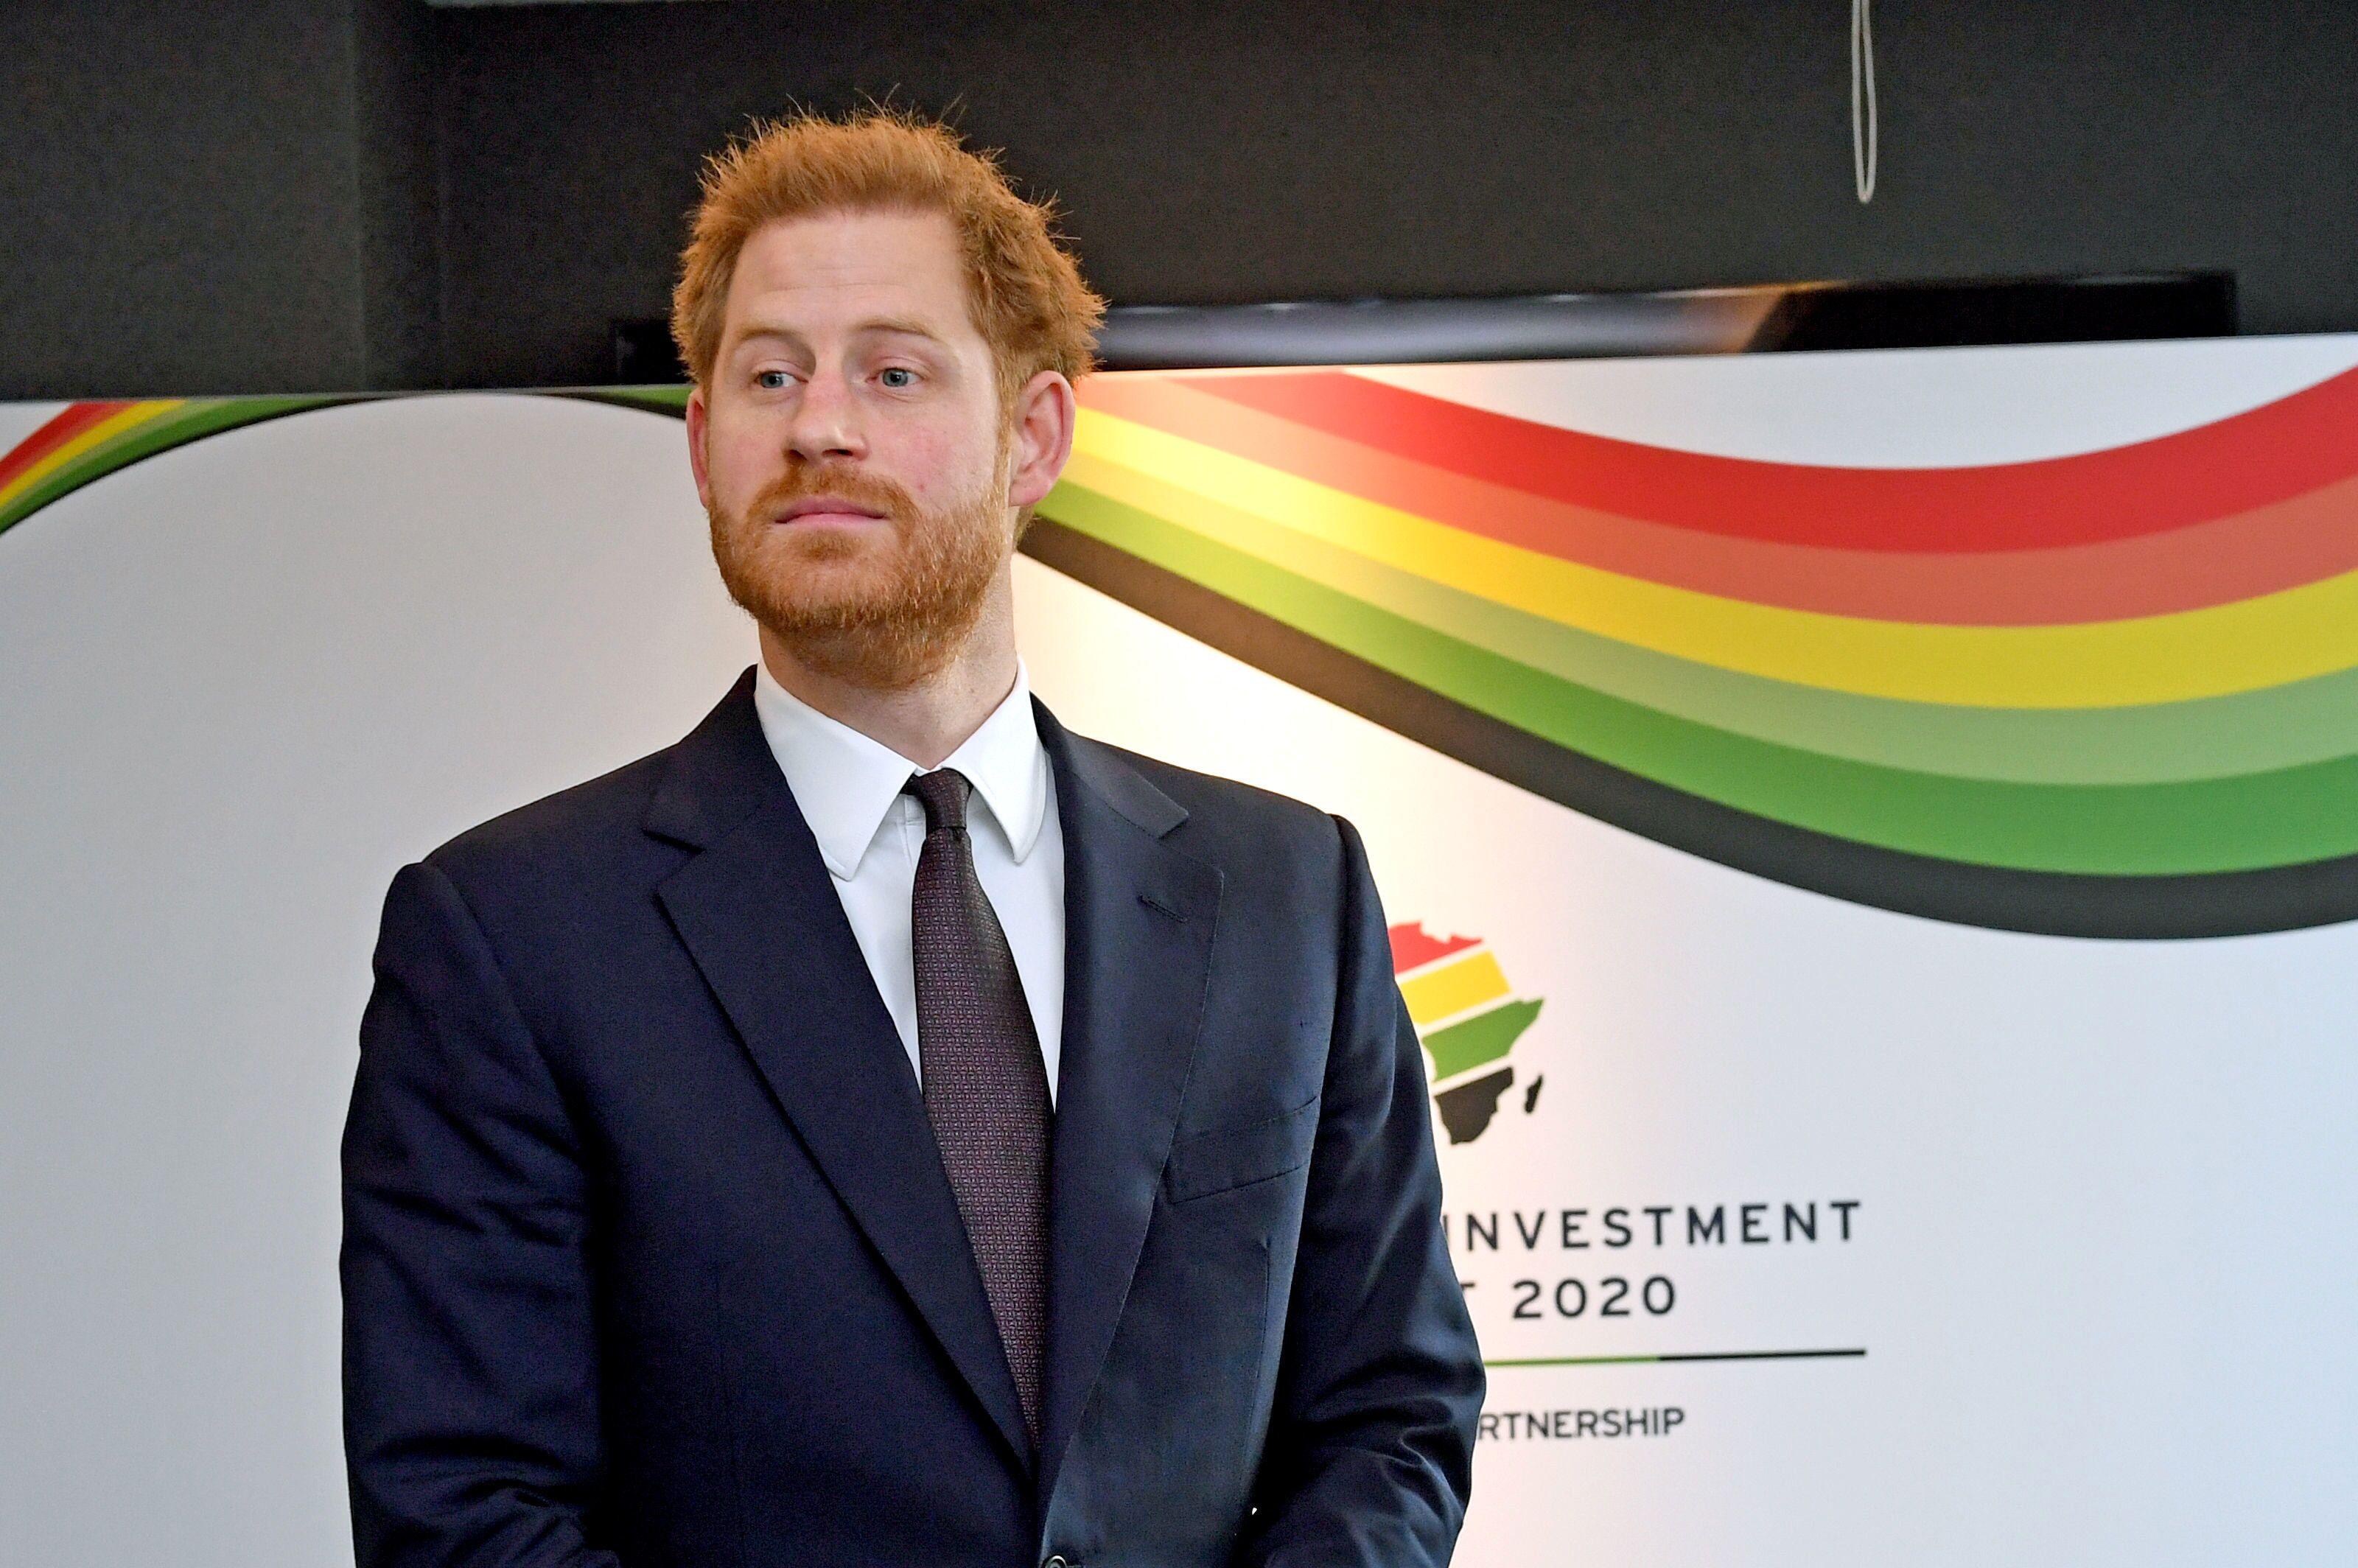 Prince Harry photo